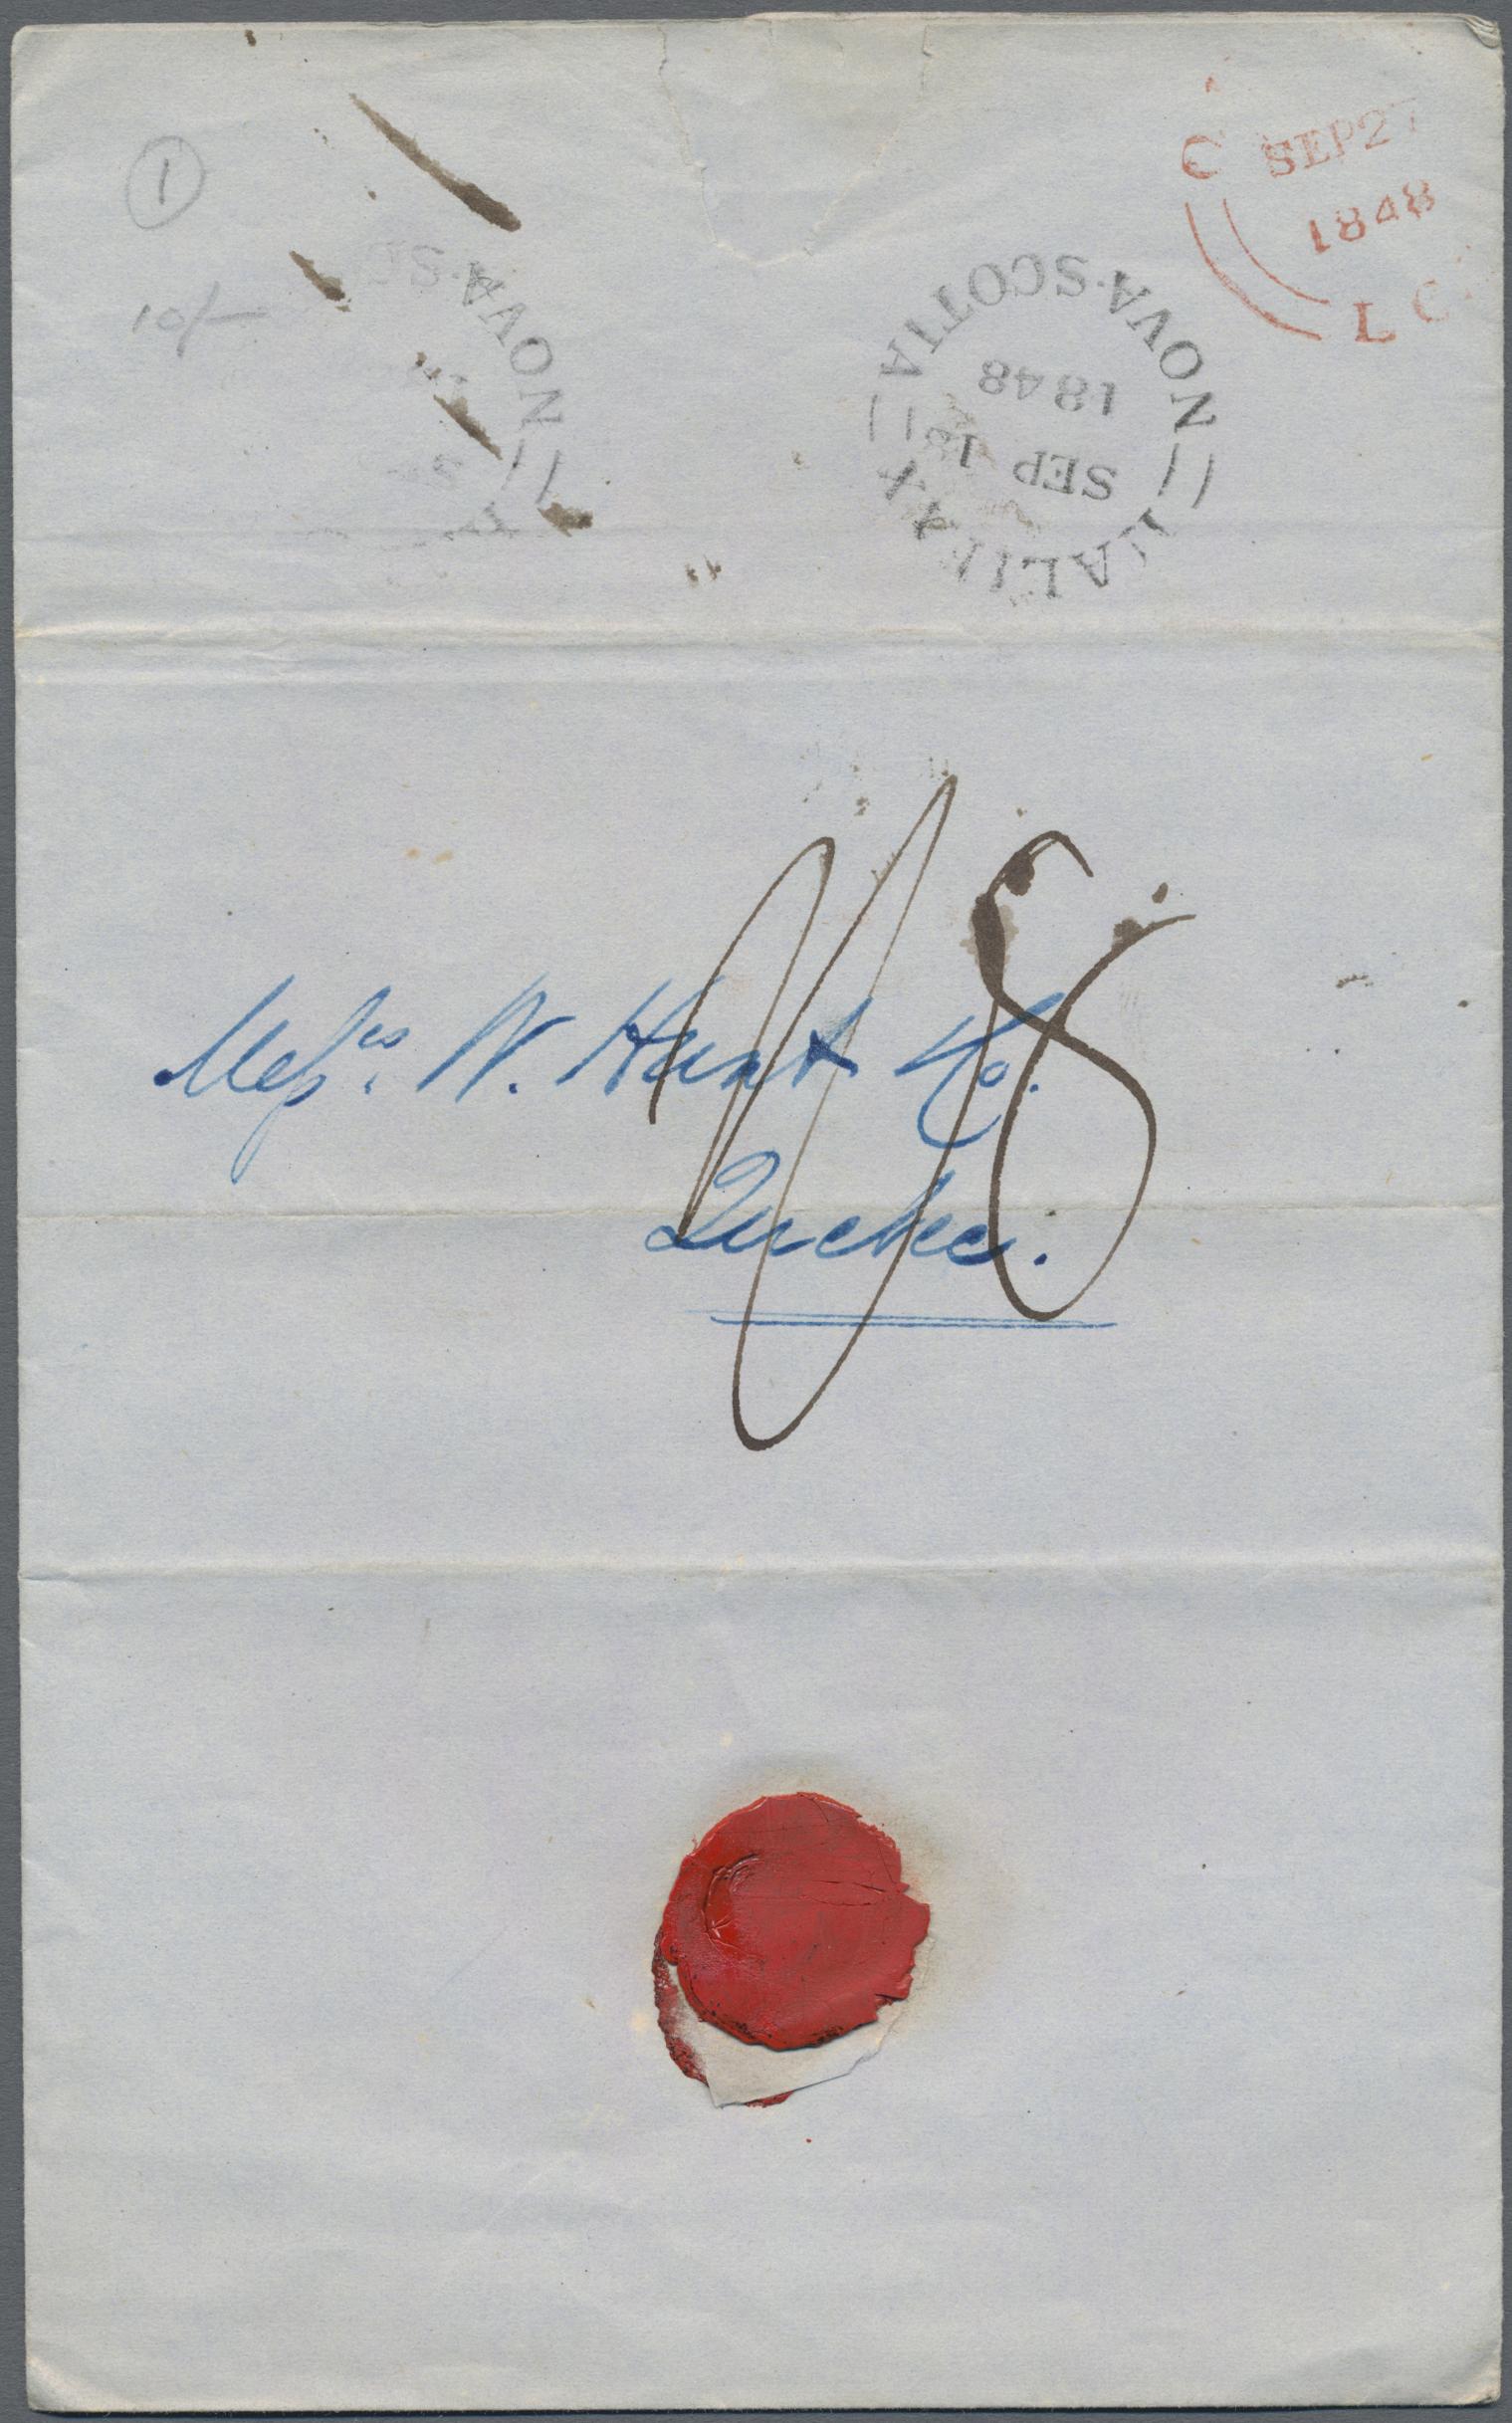 Lot 15089 - britische kolonien  -  Auktionshaus Christoph Gärtner GmbH & Co. KG Sale #48 collections Overseas  Airmail / Ship mail & Thematics